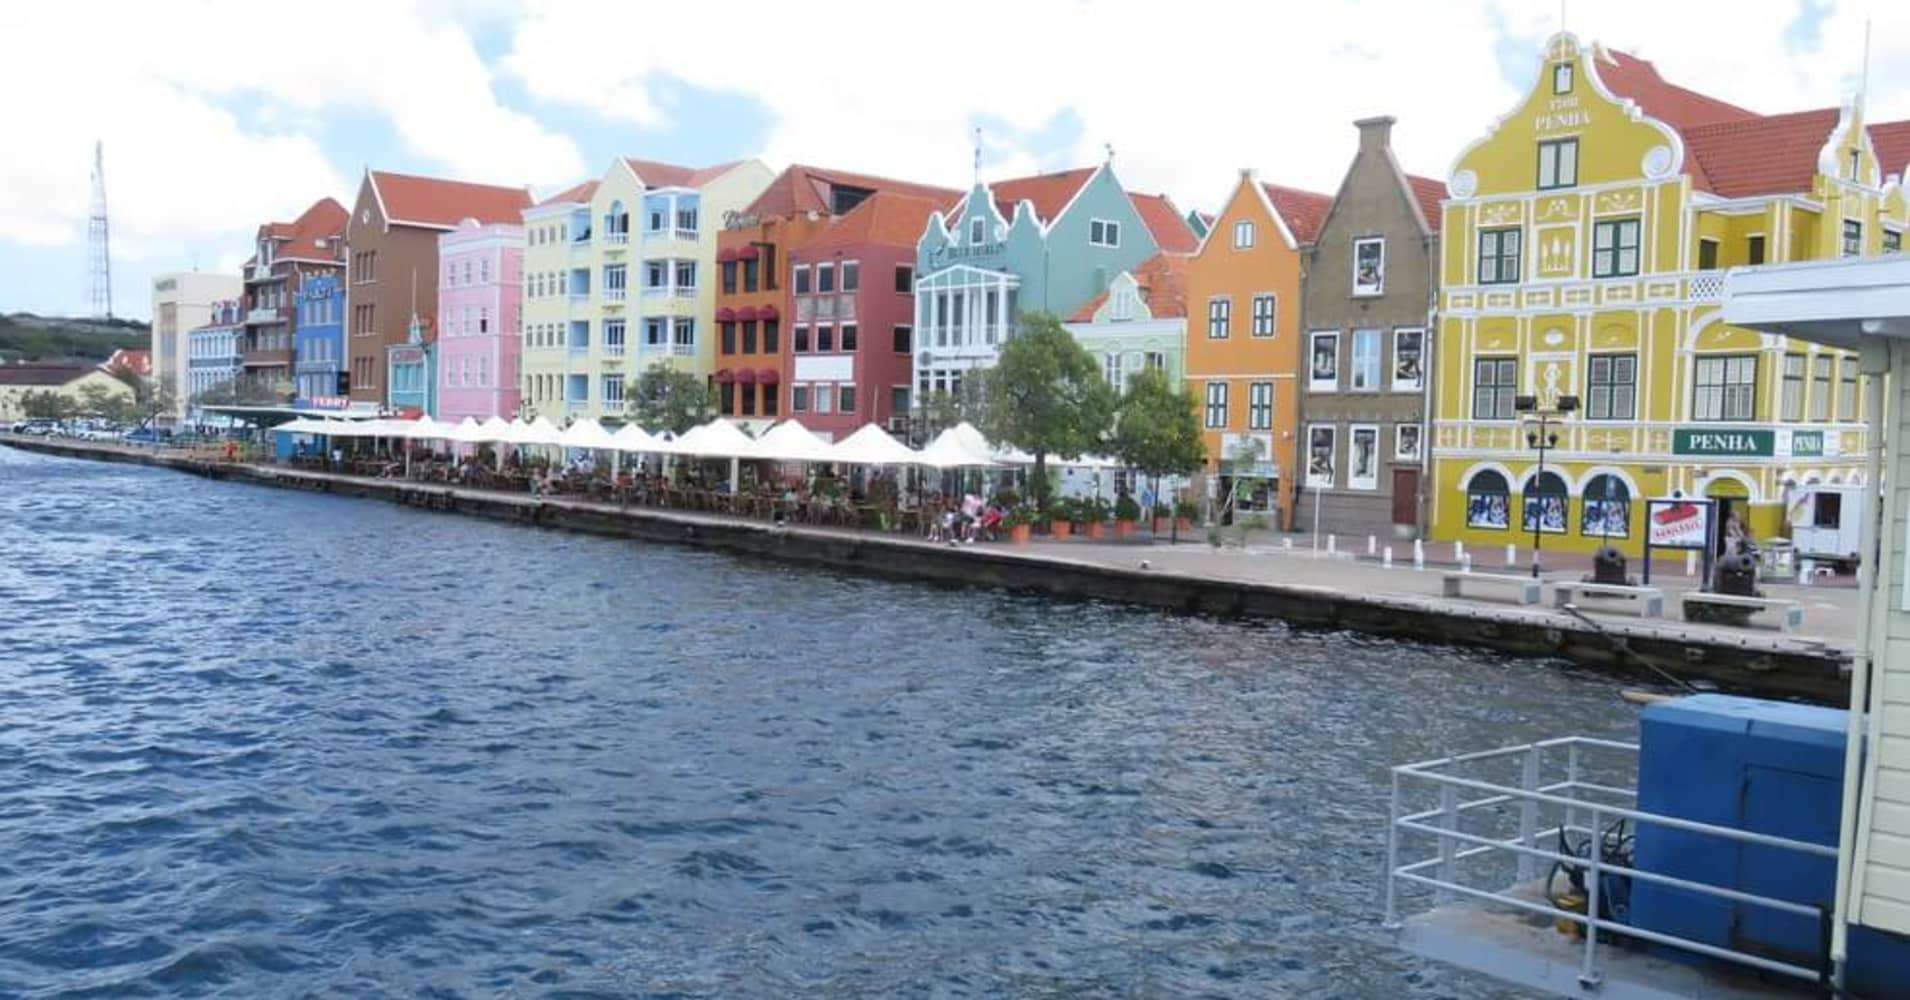 Best Cruise Destinations: Explore Top Travel Destinations ...  |Caribbean Cruise Destinations